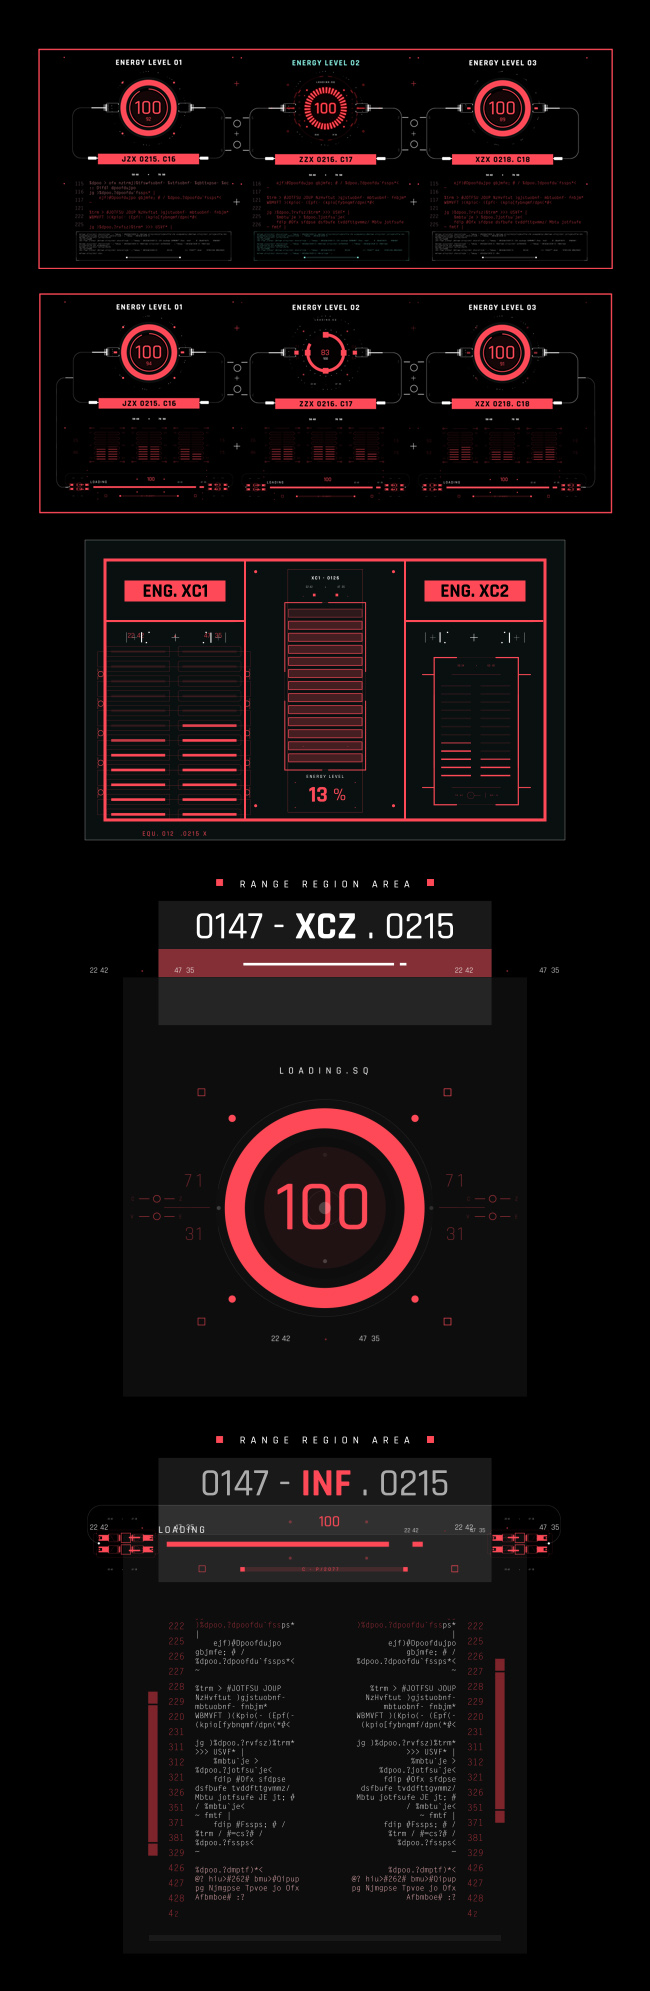 AE脚本-500个HUD高科技赛博朋克UI科幻界面元素动画预设包 Cyberpunk HUD UI 500+ 已修复中文版AE表达式报错插图35